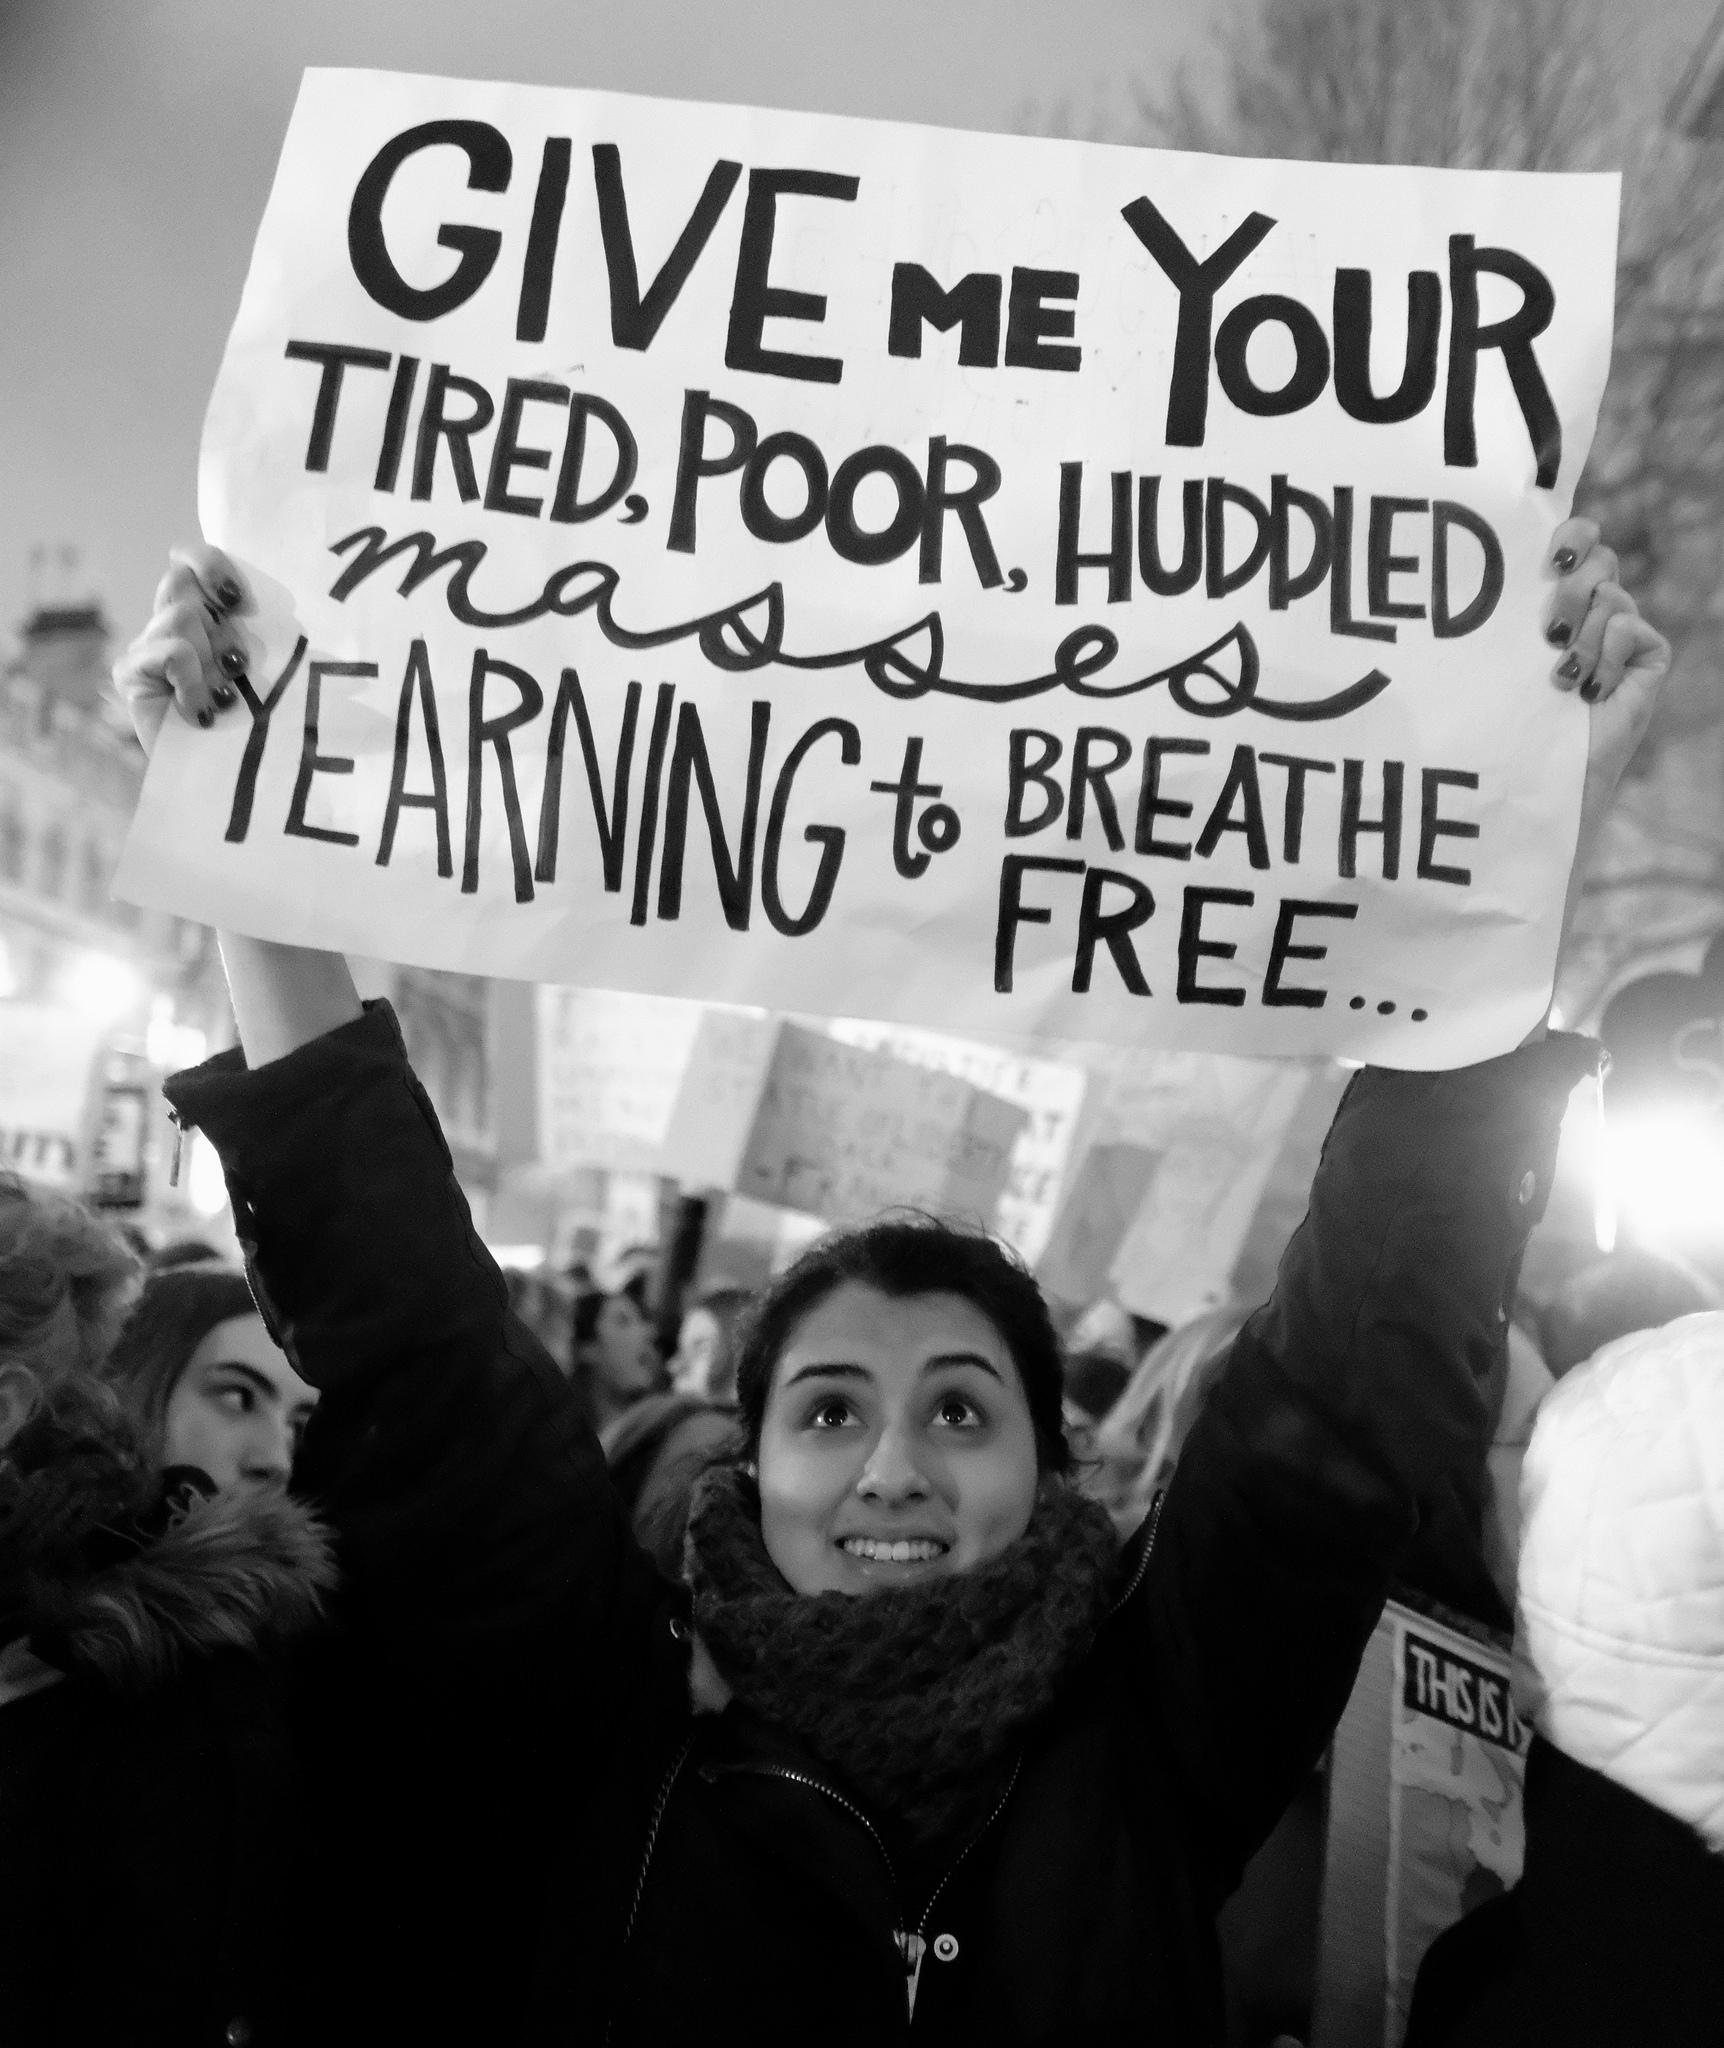 Protest in London  via Flickr  by Alisdare Hickson